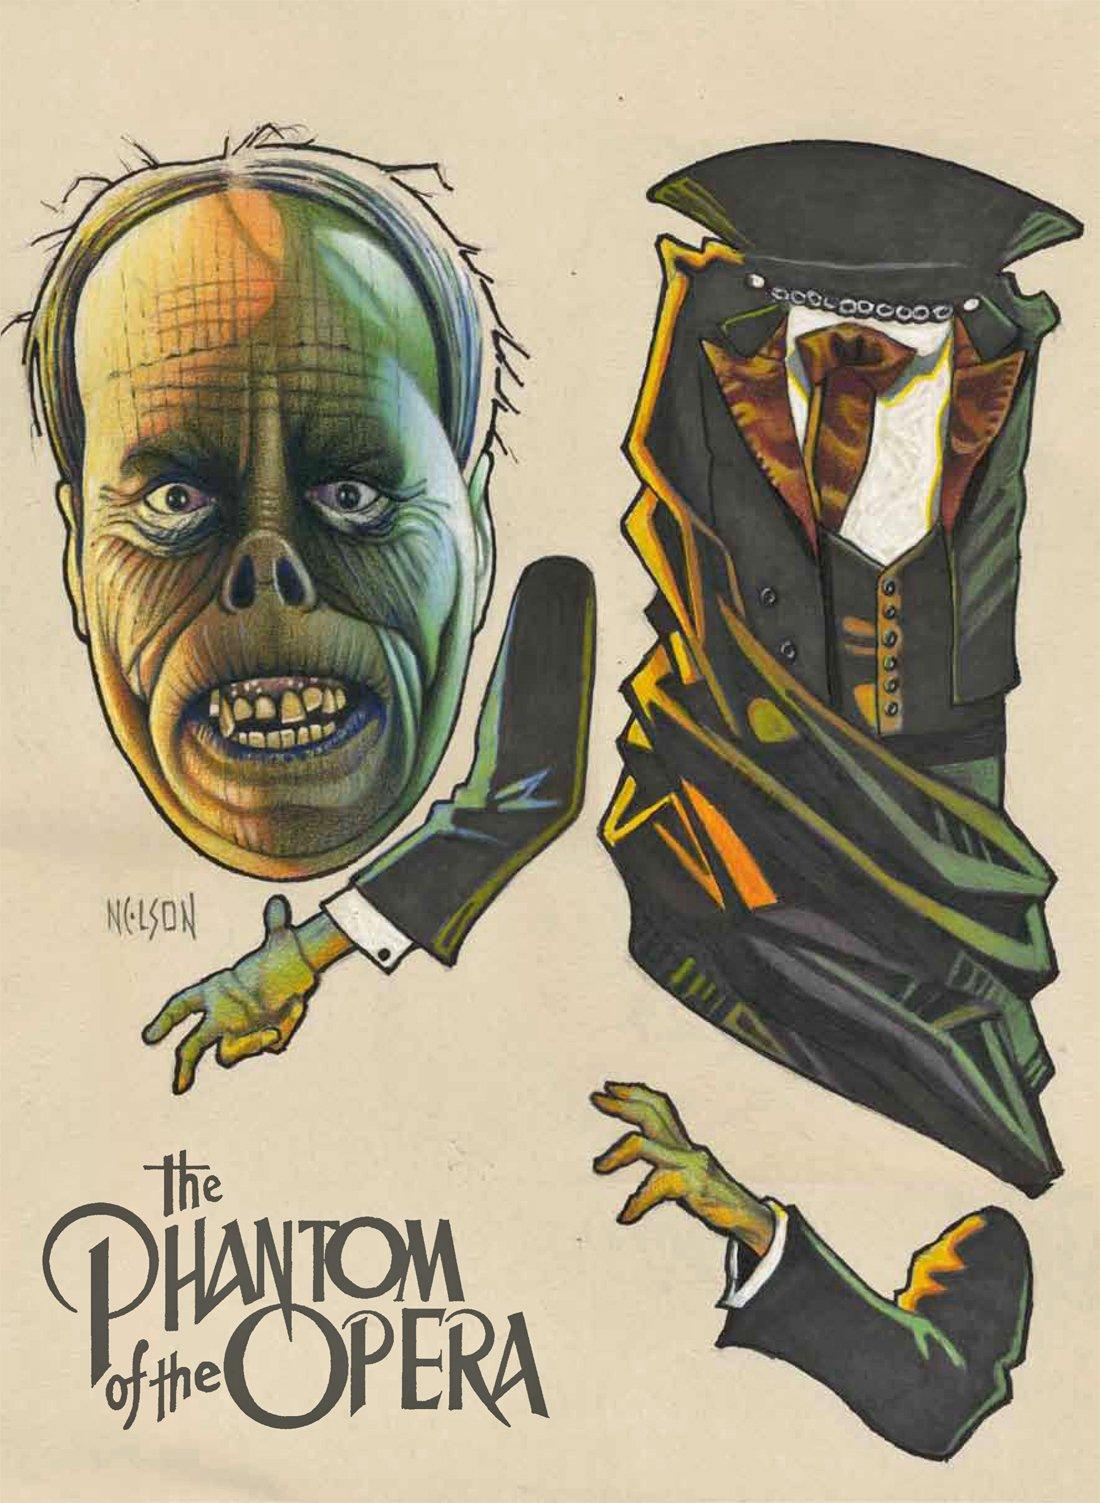 MAN OF 1000 FACES Lon Chaney ART OF BILL NELSON Ltd Edition HC Book RICK BAKER!